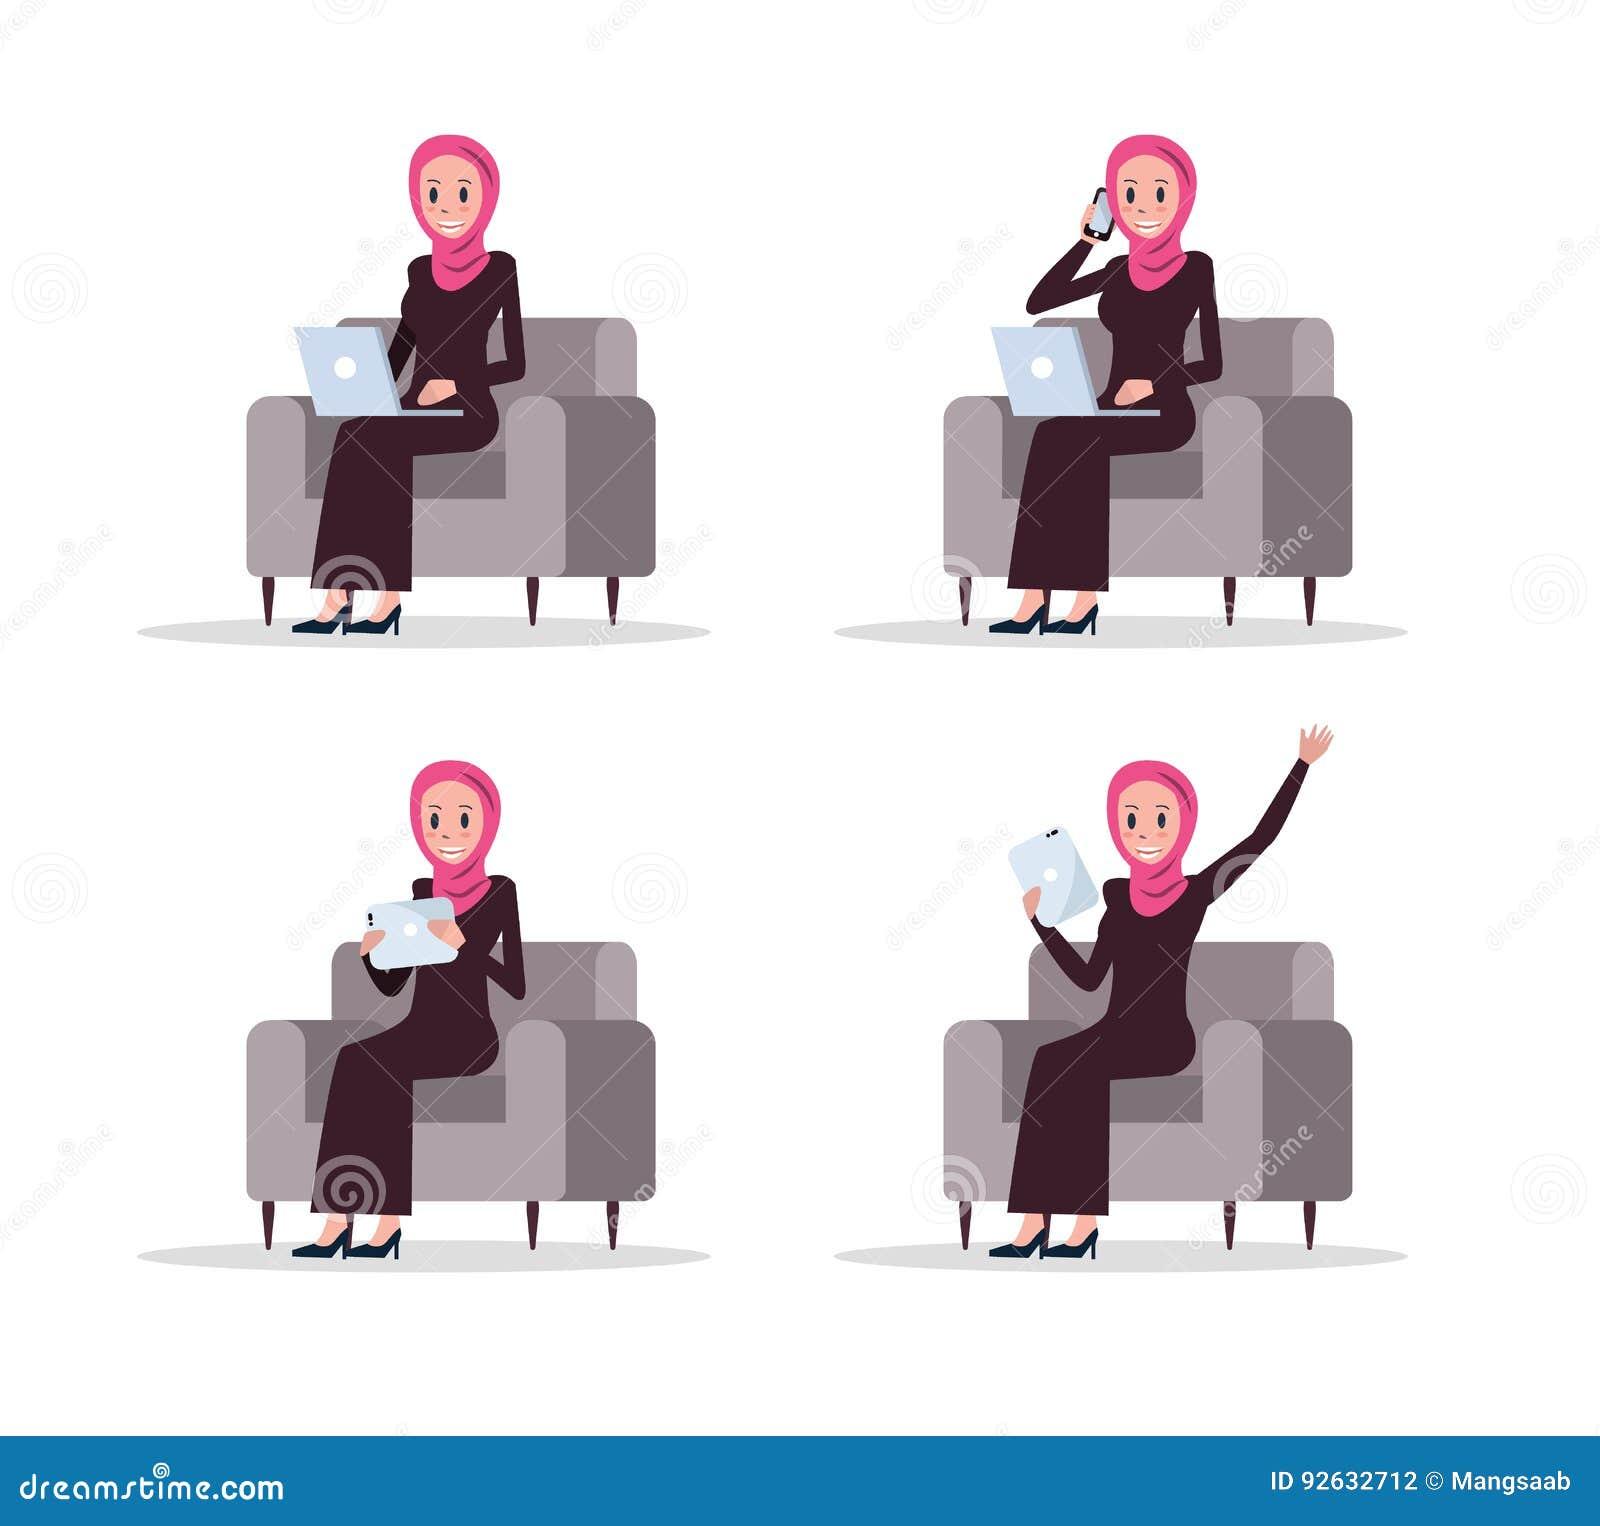 Character Design Using Illustrator : Set of arab business woman using smart device on sofa